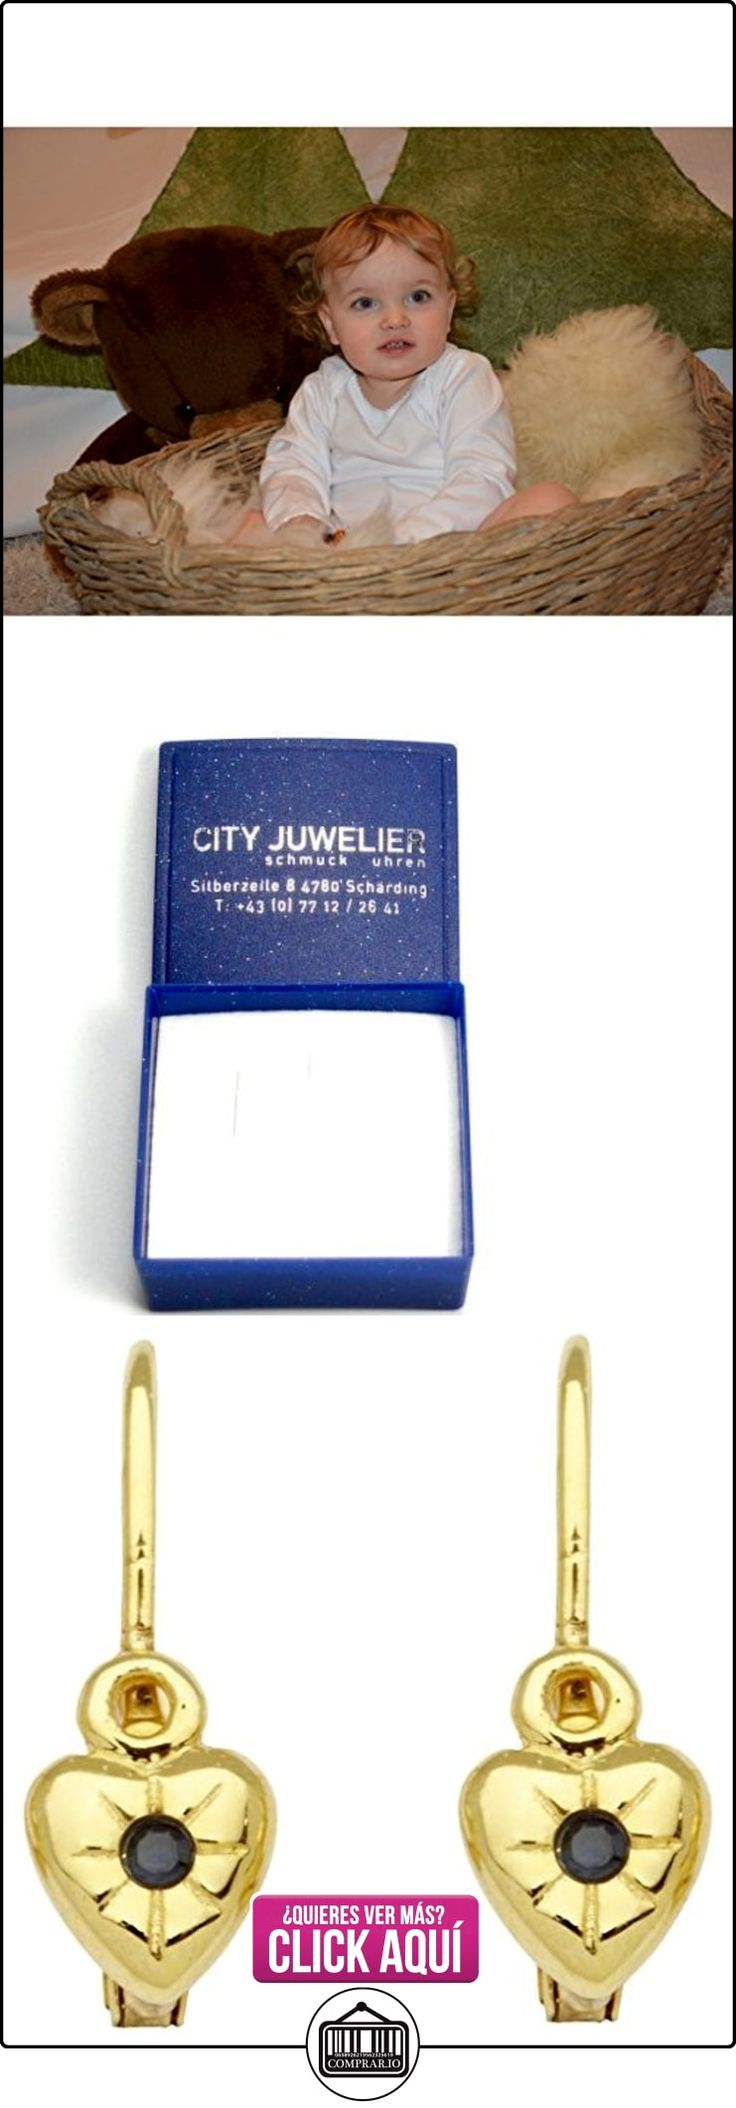 Basic oro KI28 niñas aretes en forma de corazón{14} puiido ({585}) niños joyas oro amarillo azul zafiro  ✿ Joyas para niñas - Regalos ✿ ▬► Ver oferta: https://comprar.io/goto/B00L9BOEI8